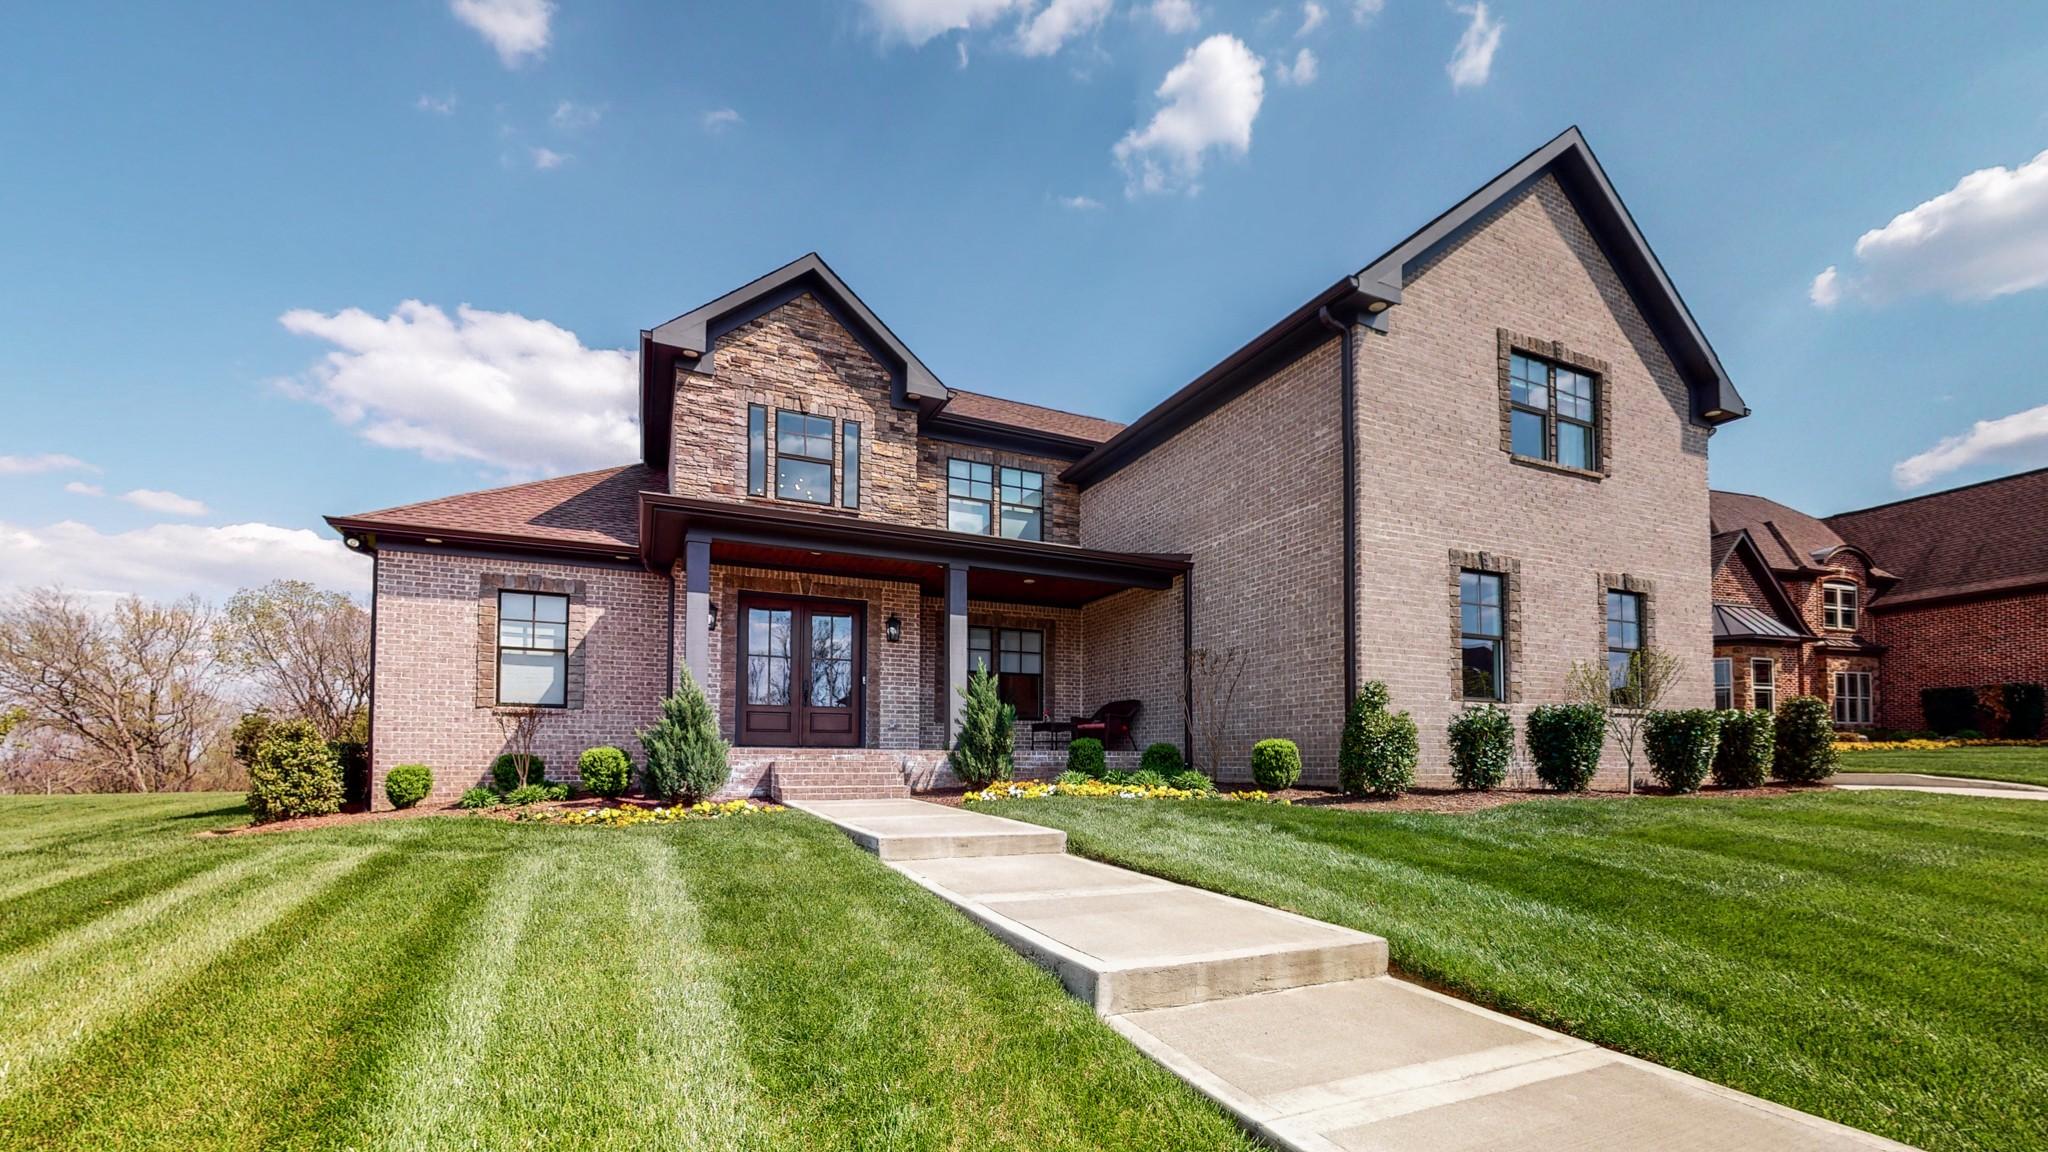 305 Charleston St Property Photo - Lebanon, TN real estate listing